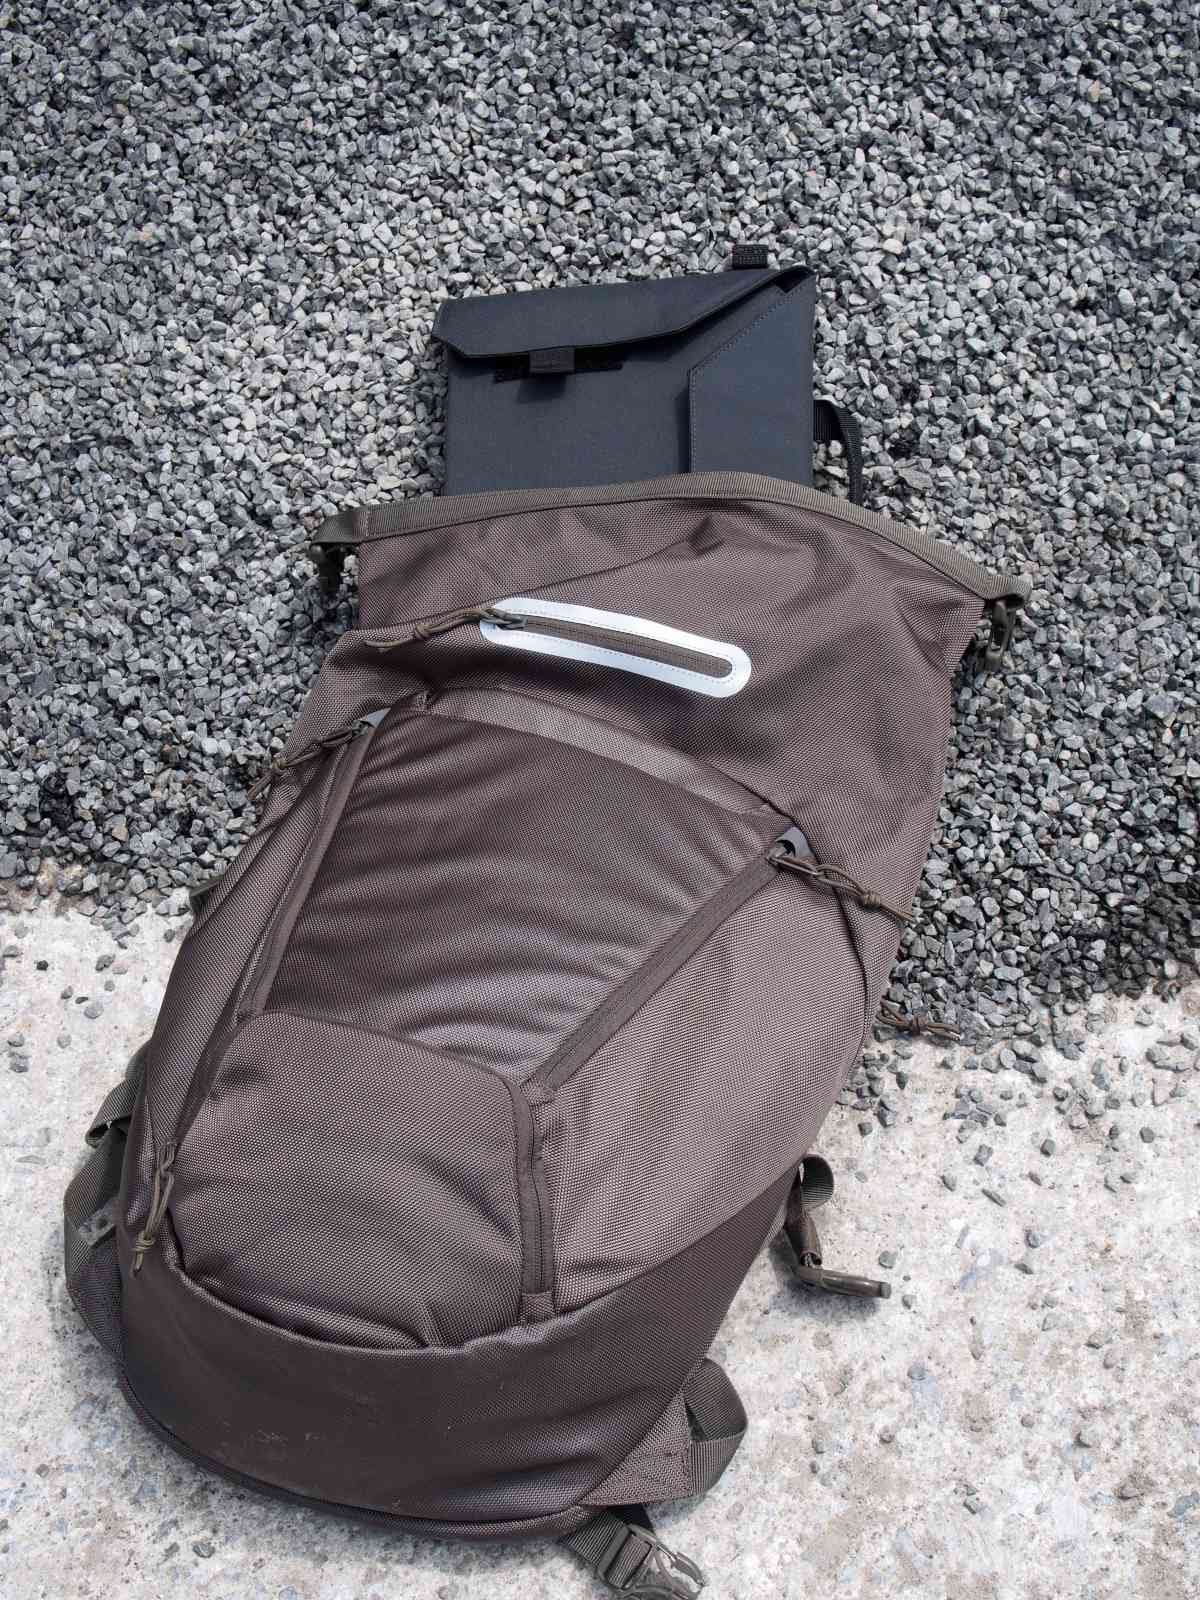 5.11 Tactical Covert Boxpack - Offener  Rollverschluss